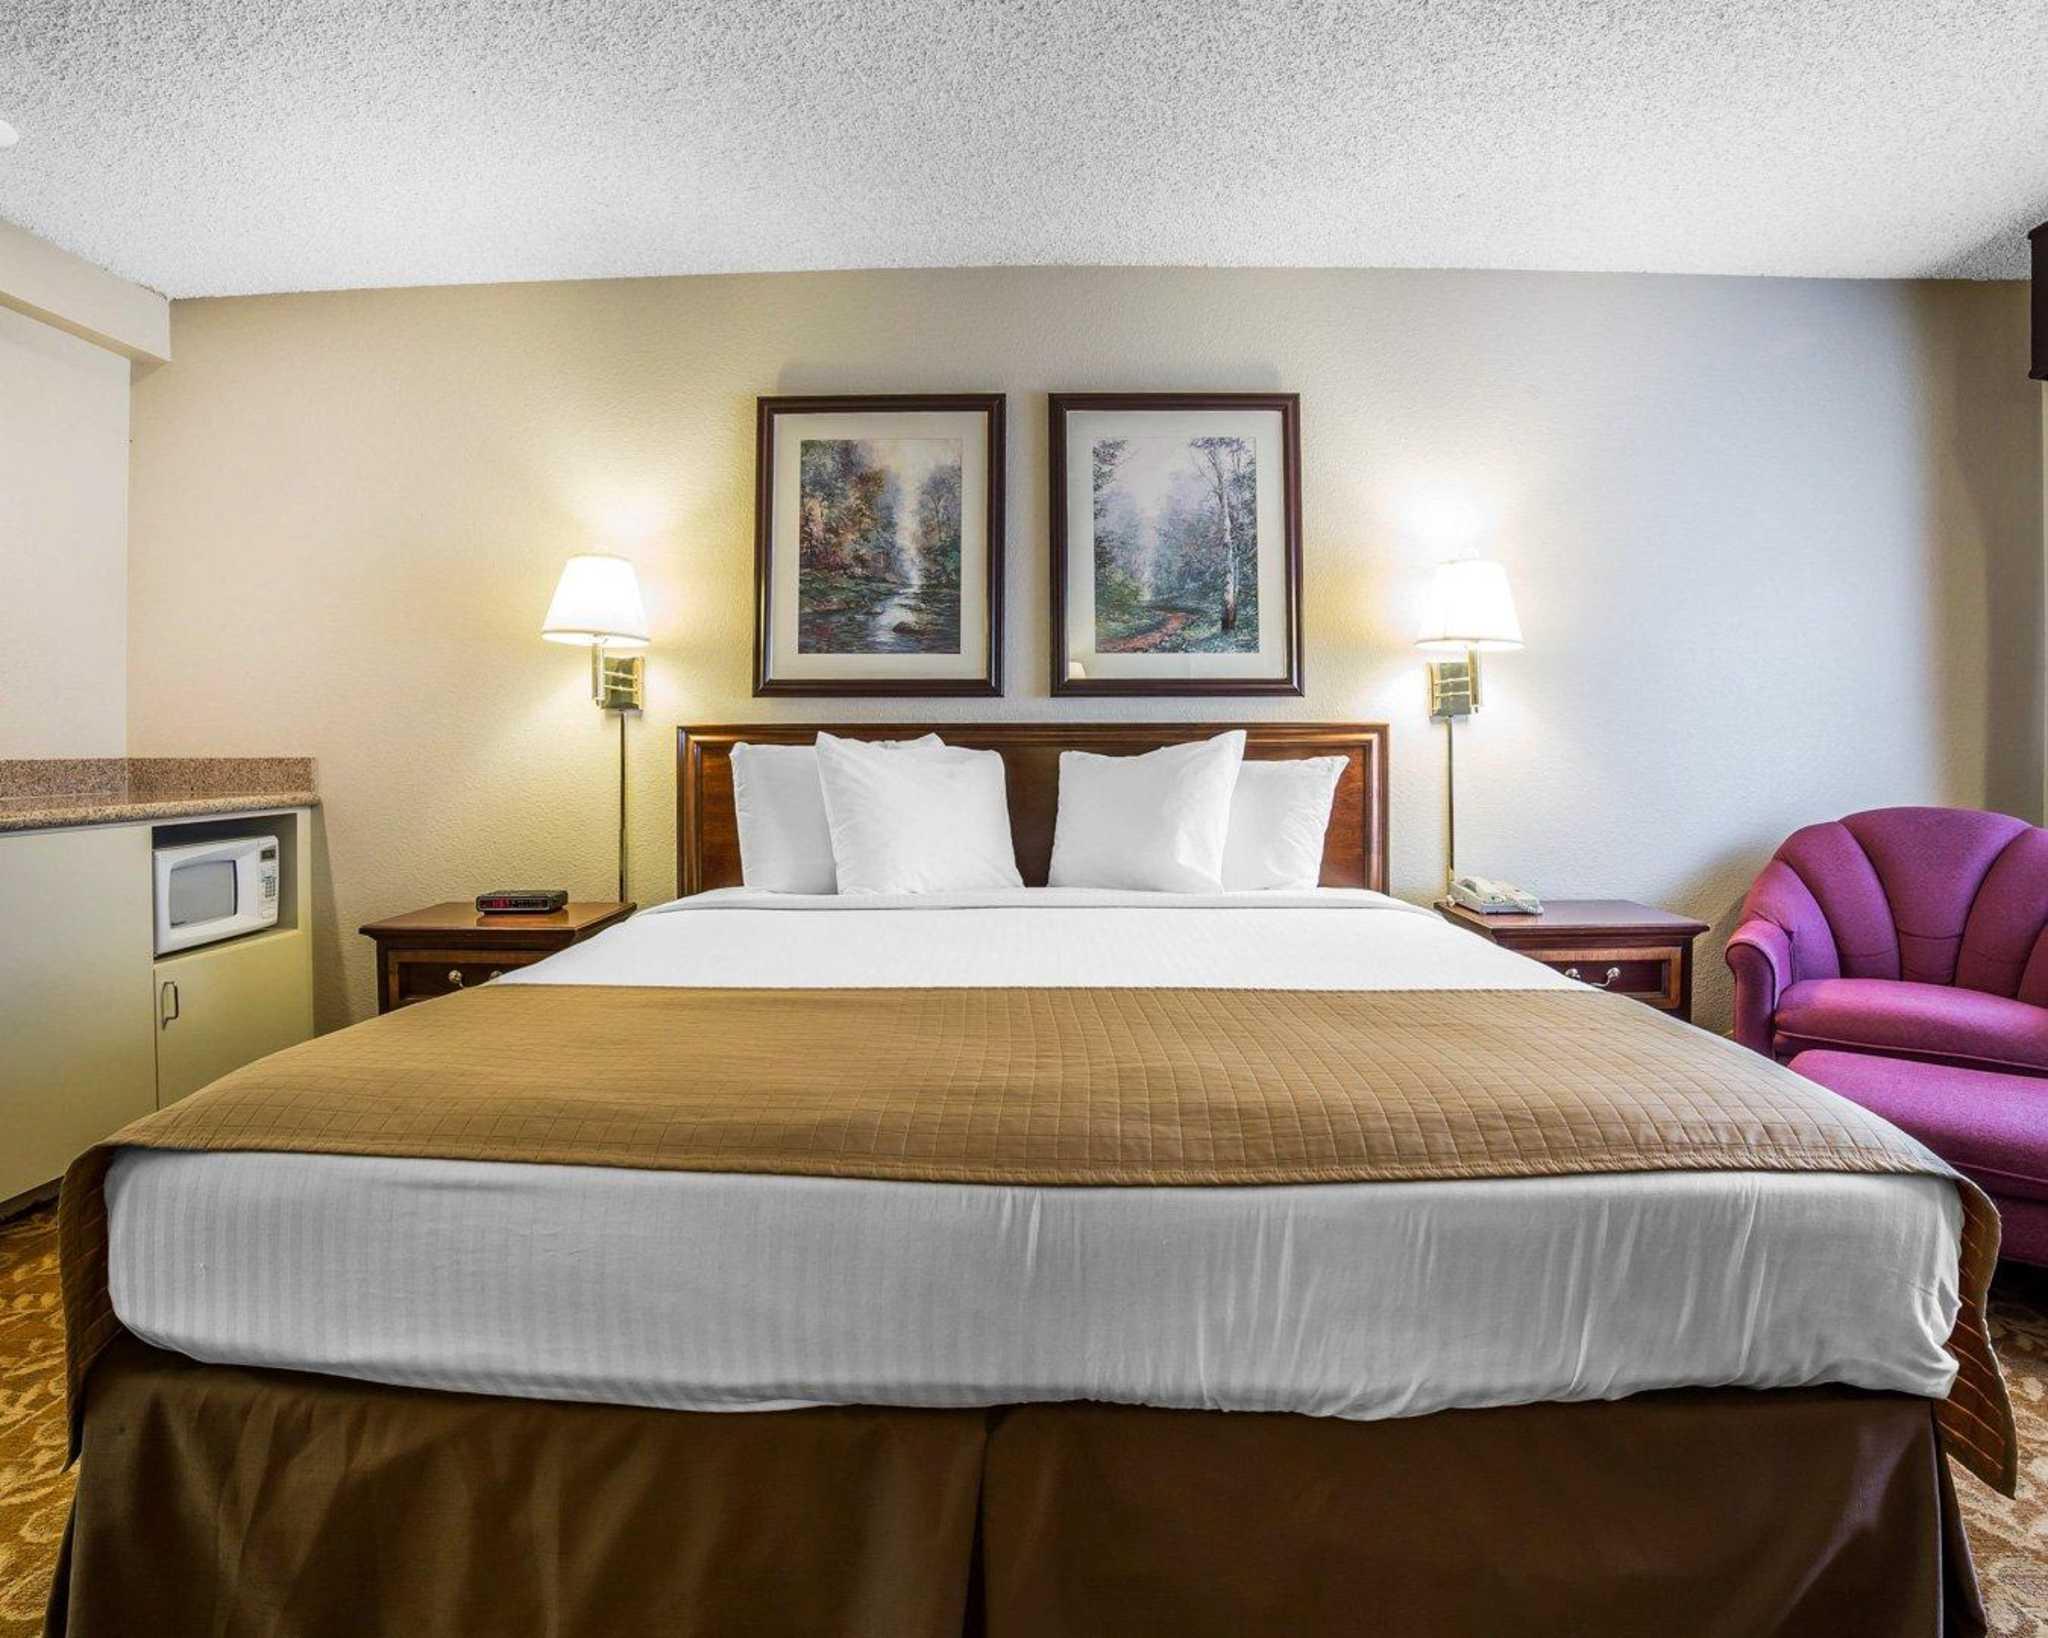 Quality Inn & Suites Minden US-395 image 24